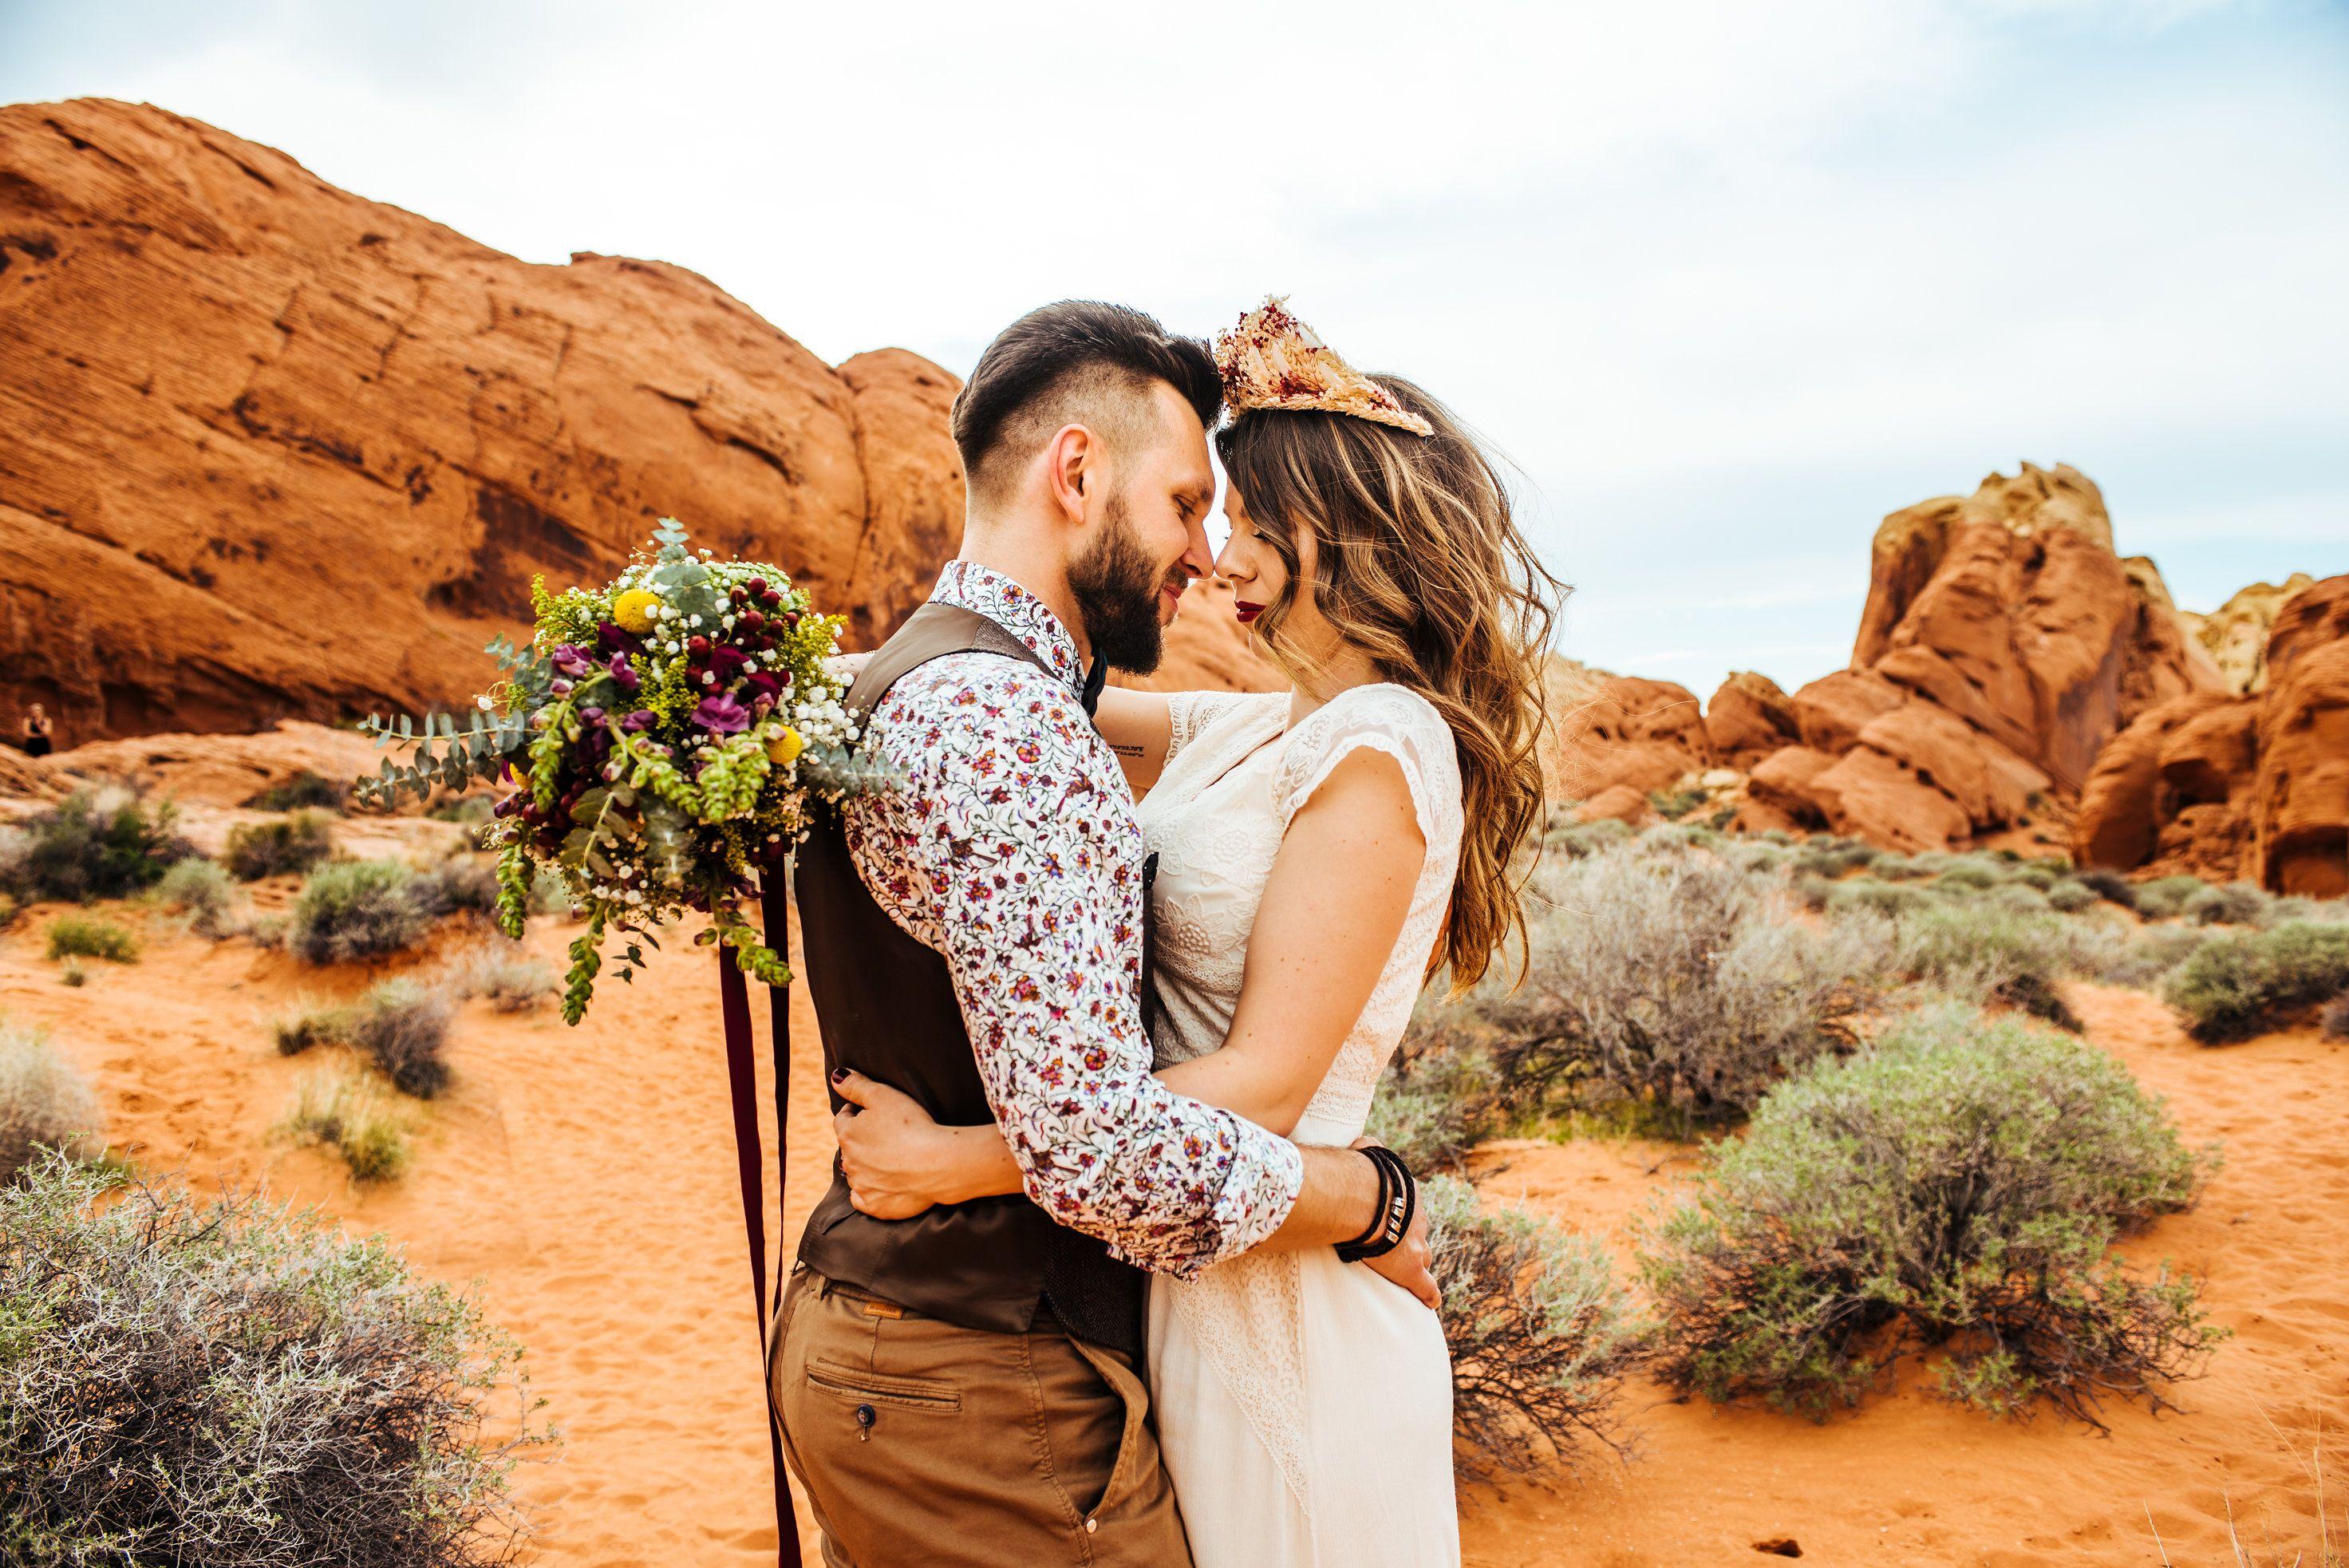 Las Vegas Desert wedding and elopement photo Ashley